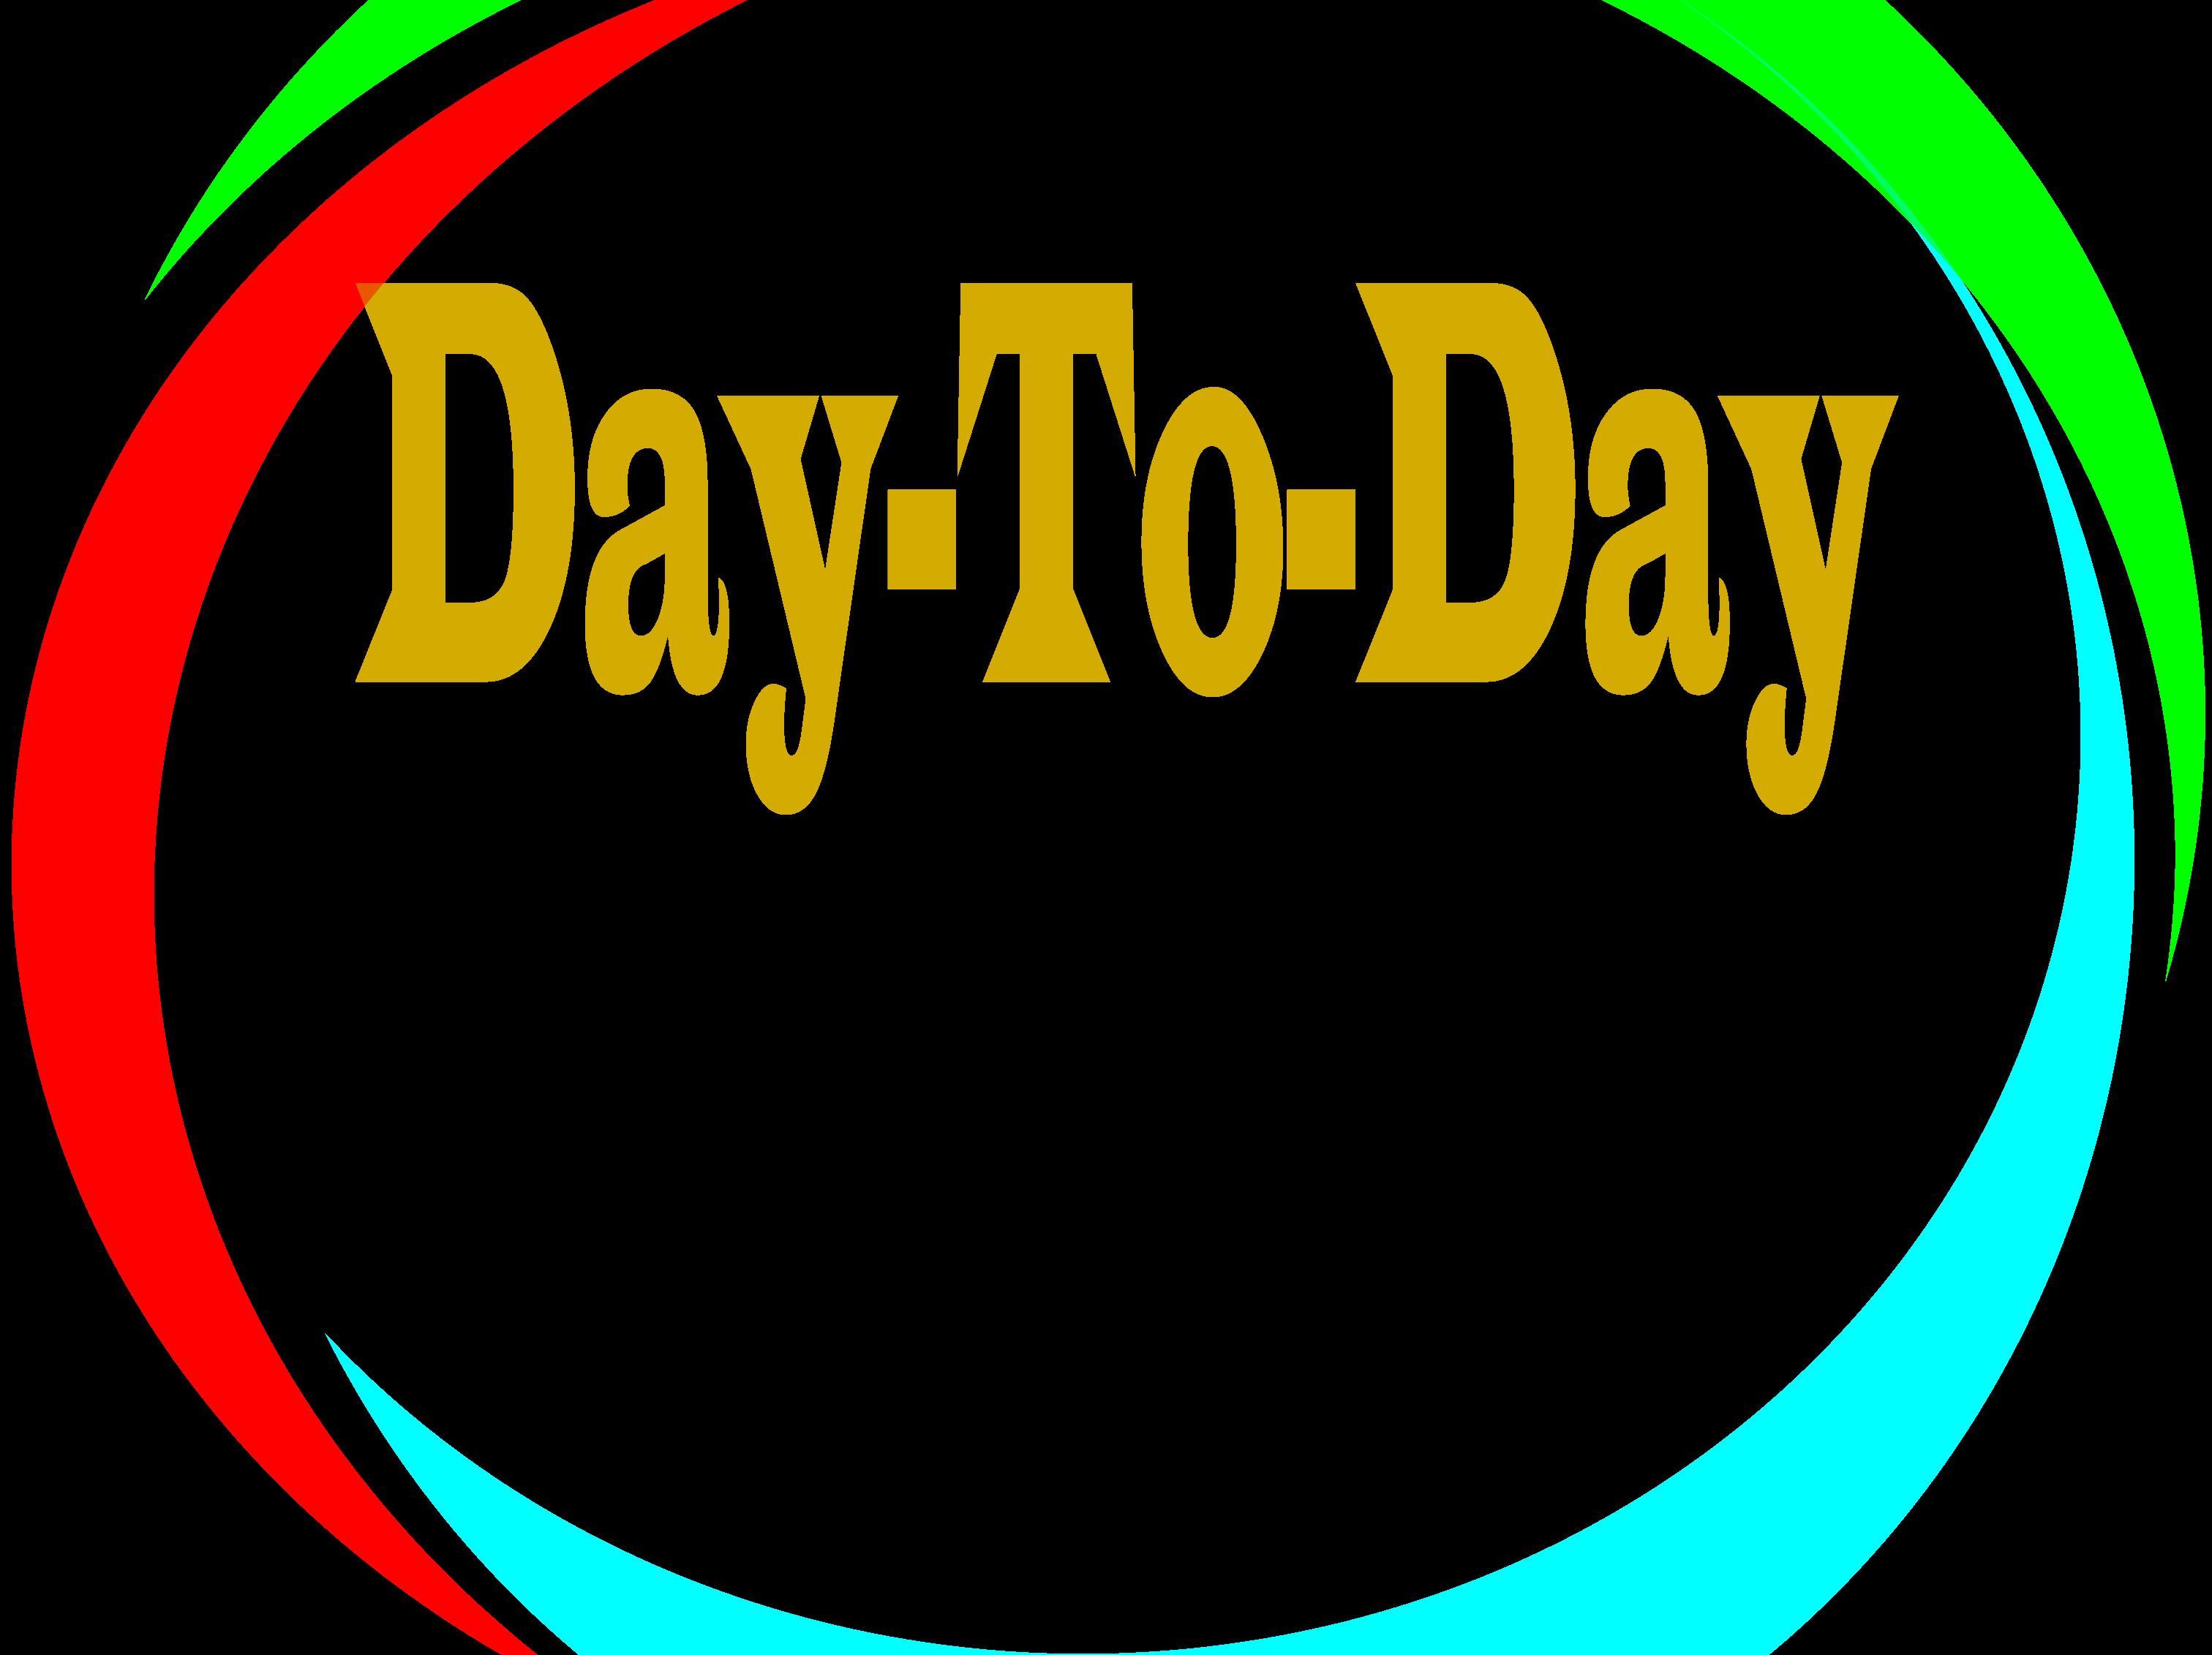 DayToDayContent